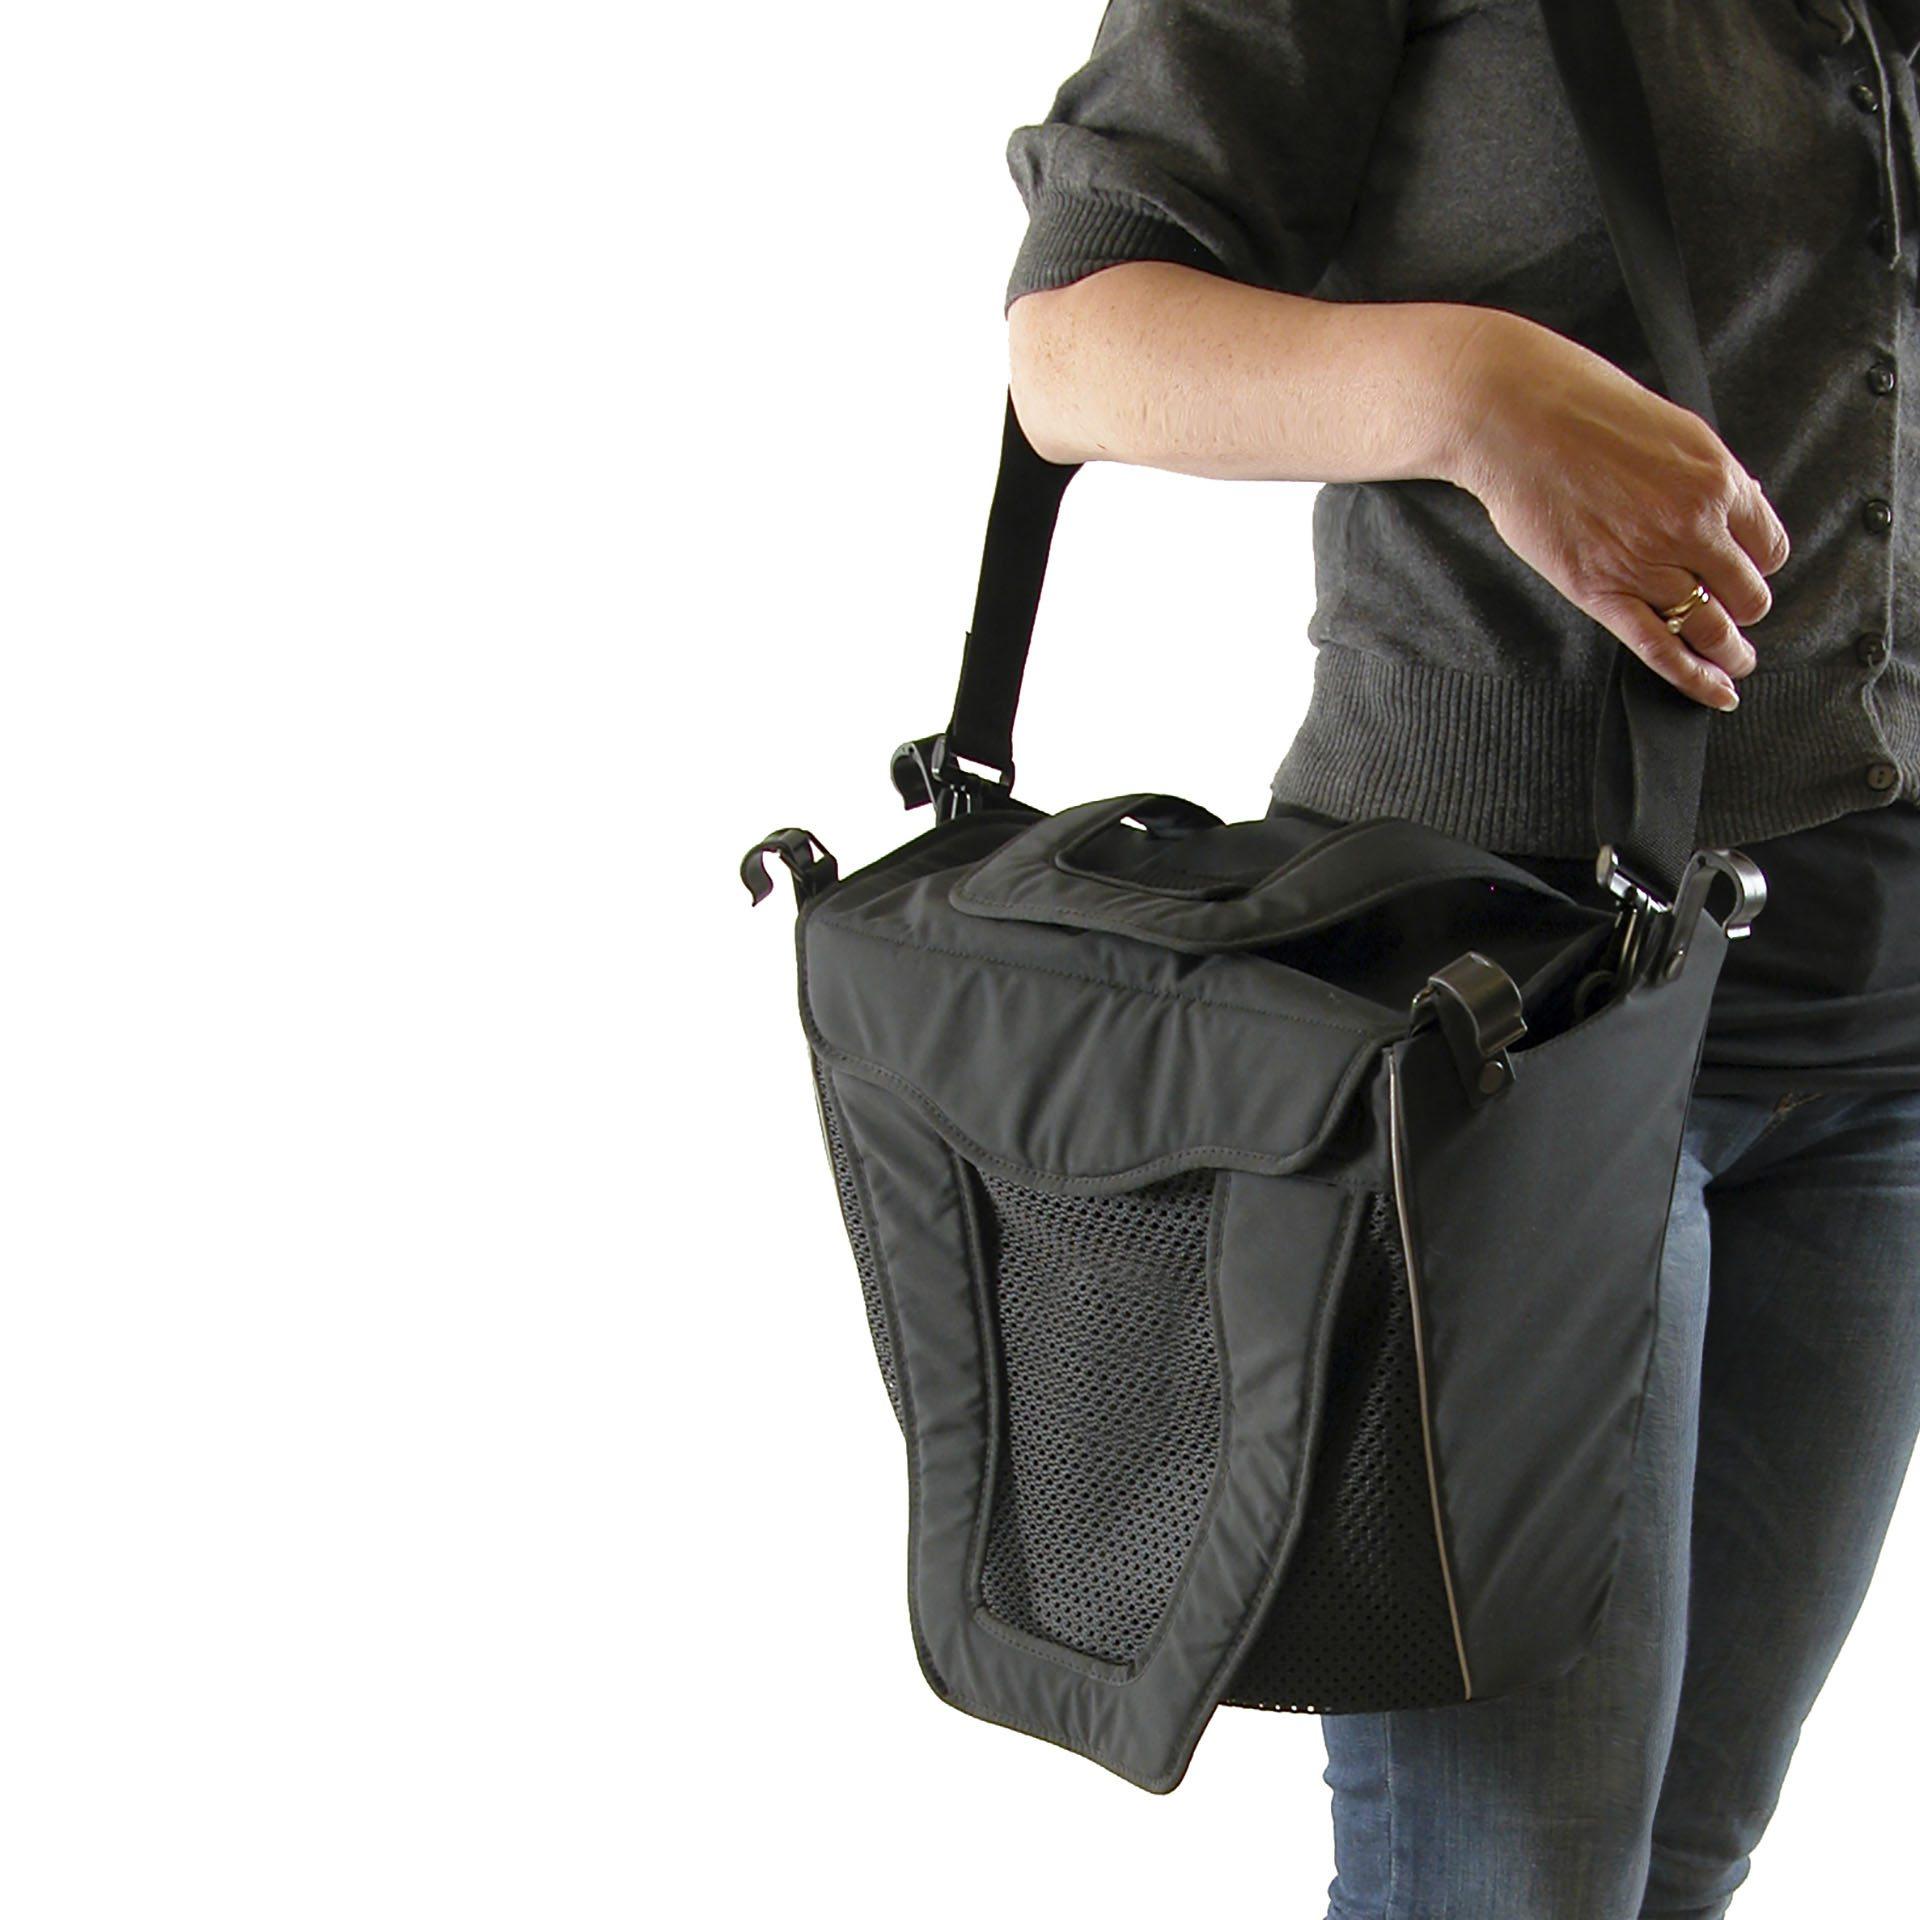 Gemino rollator met schouder tas van Sunrise Medical